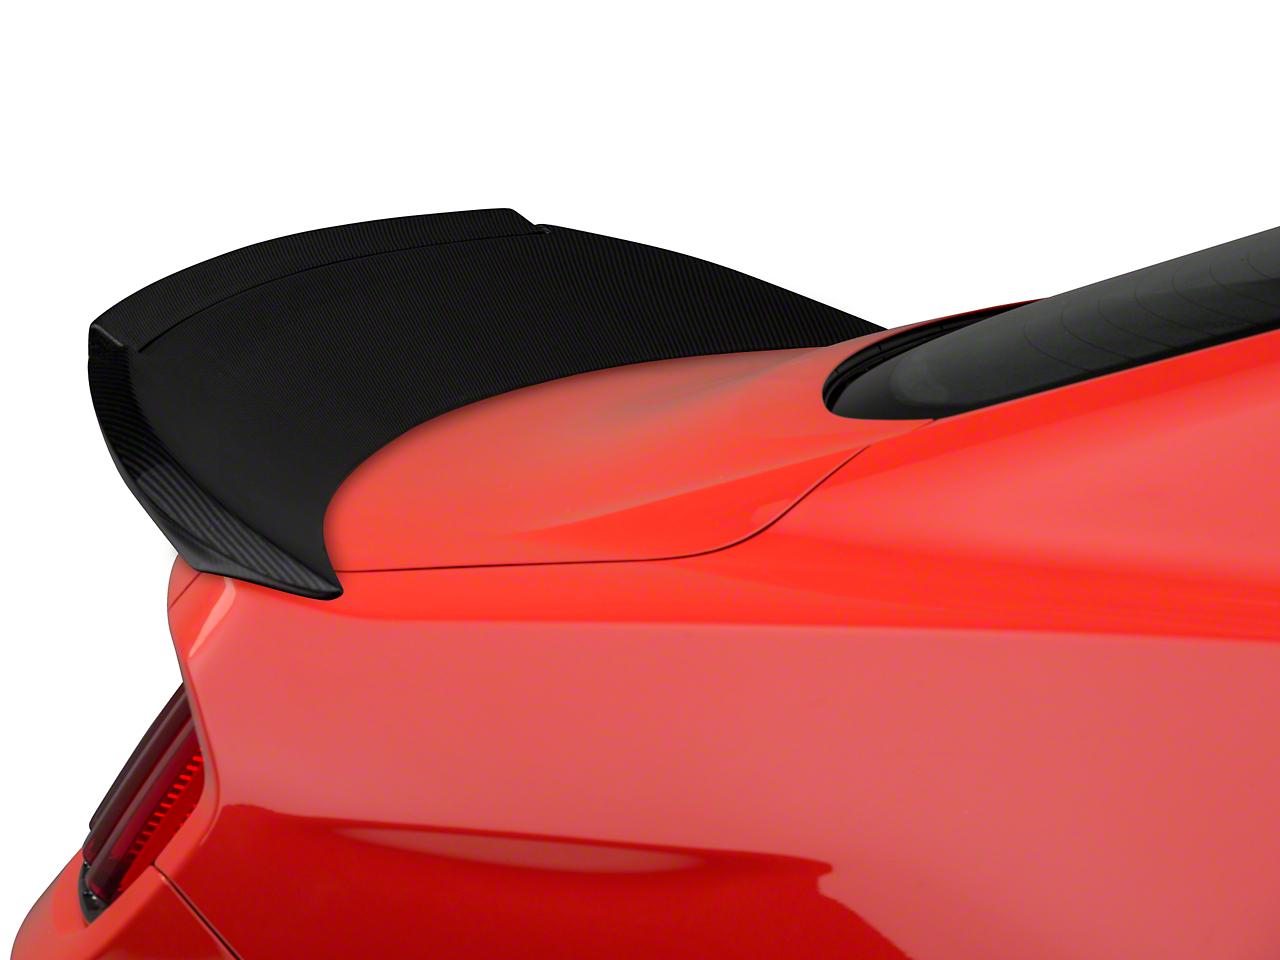 Trufiber Carbon Fiber Rear Spoiler w/ Gurney Flap (15-18 Fastback)